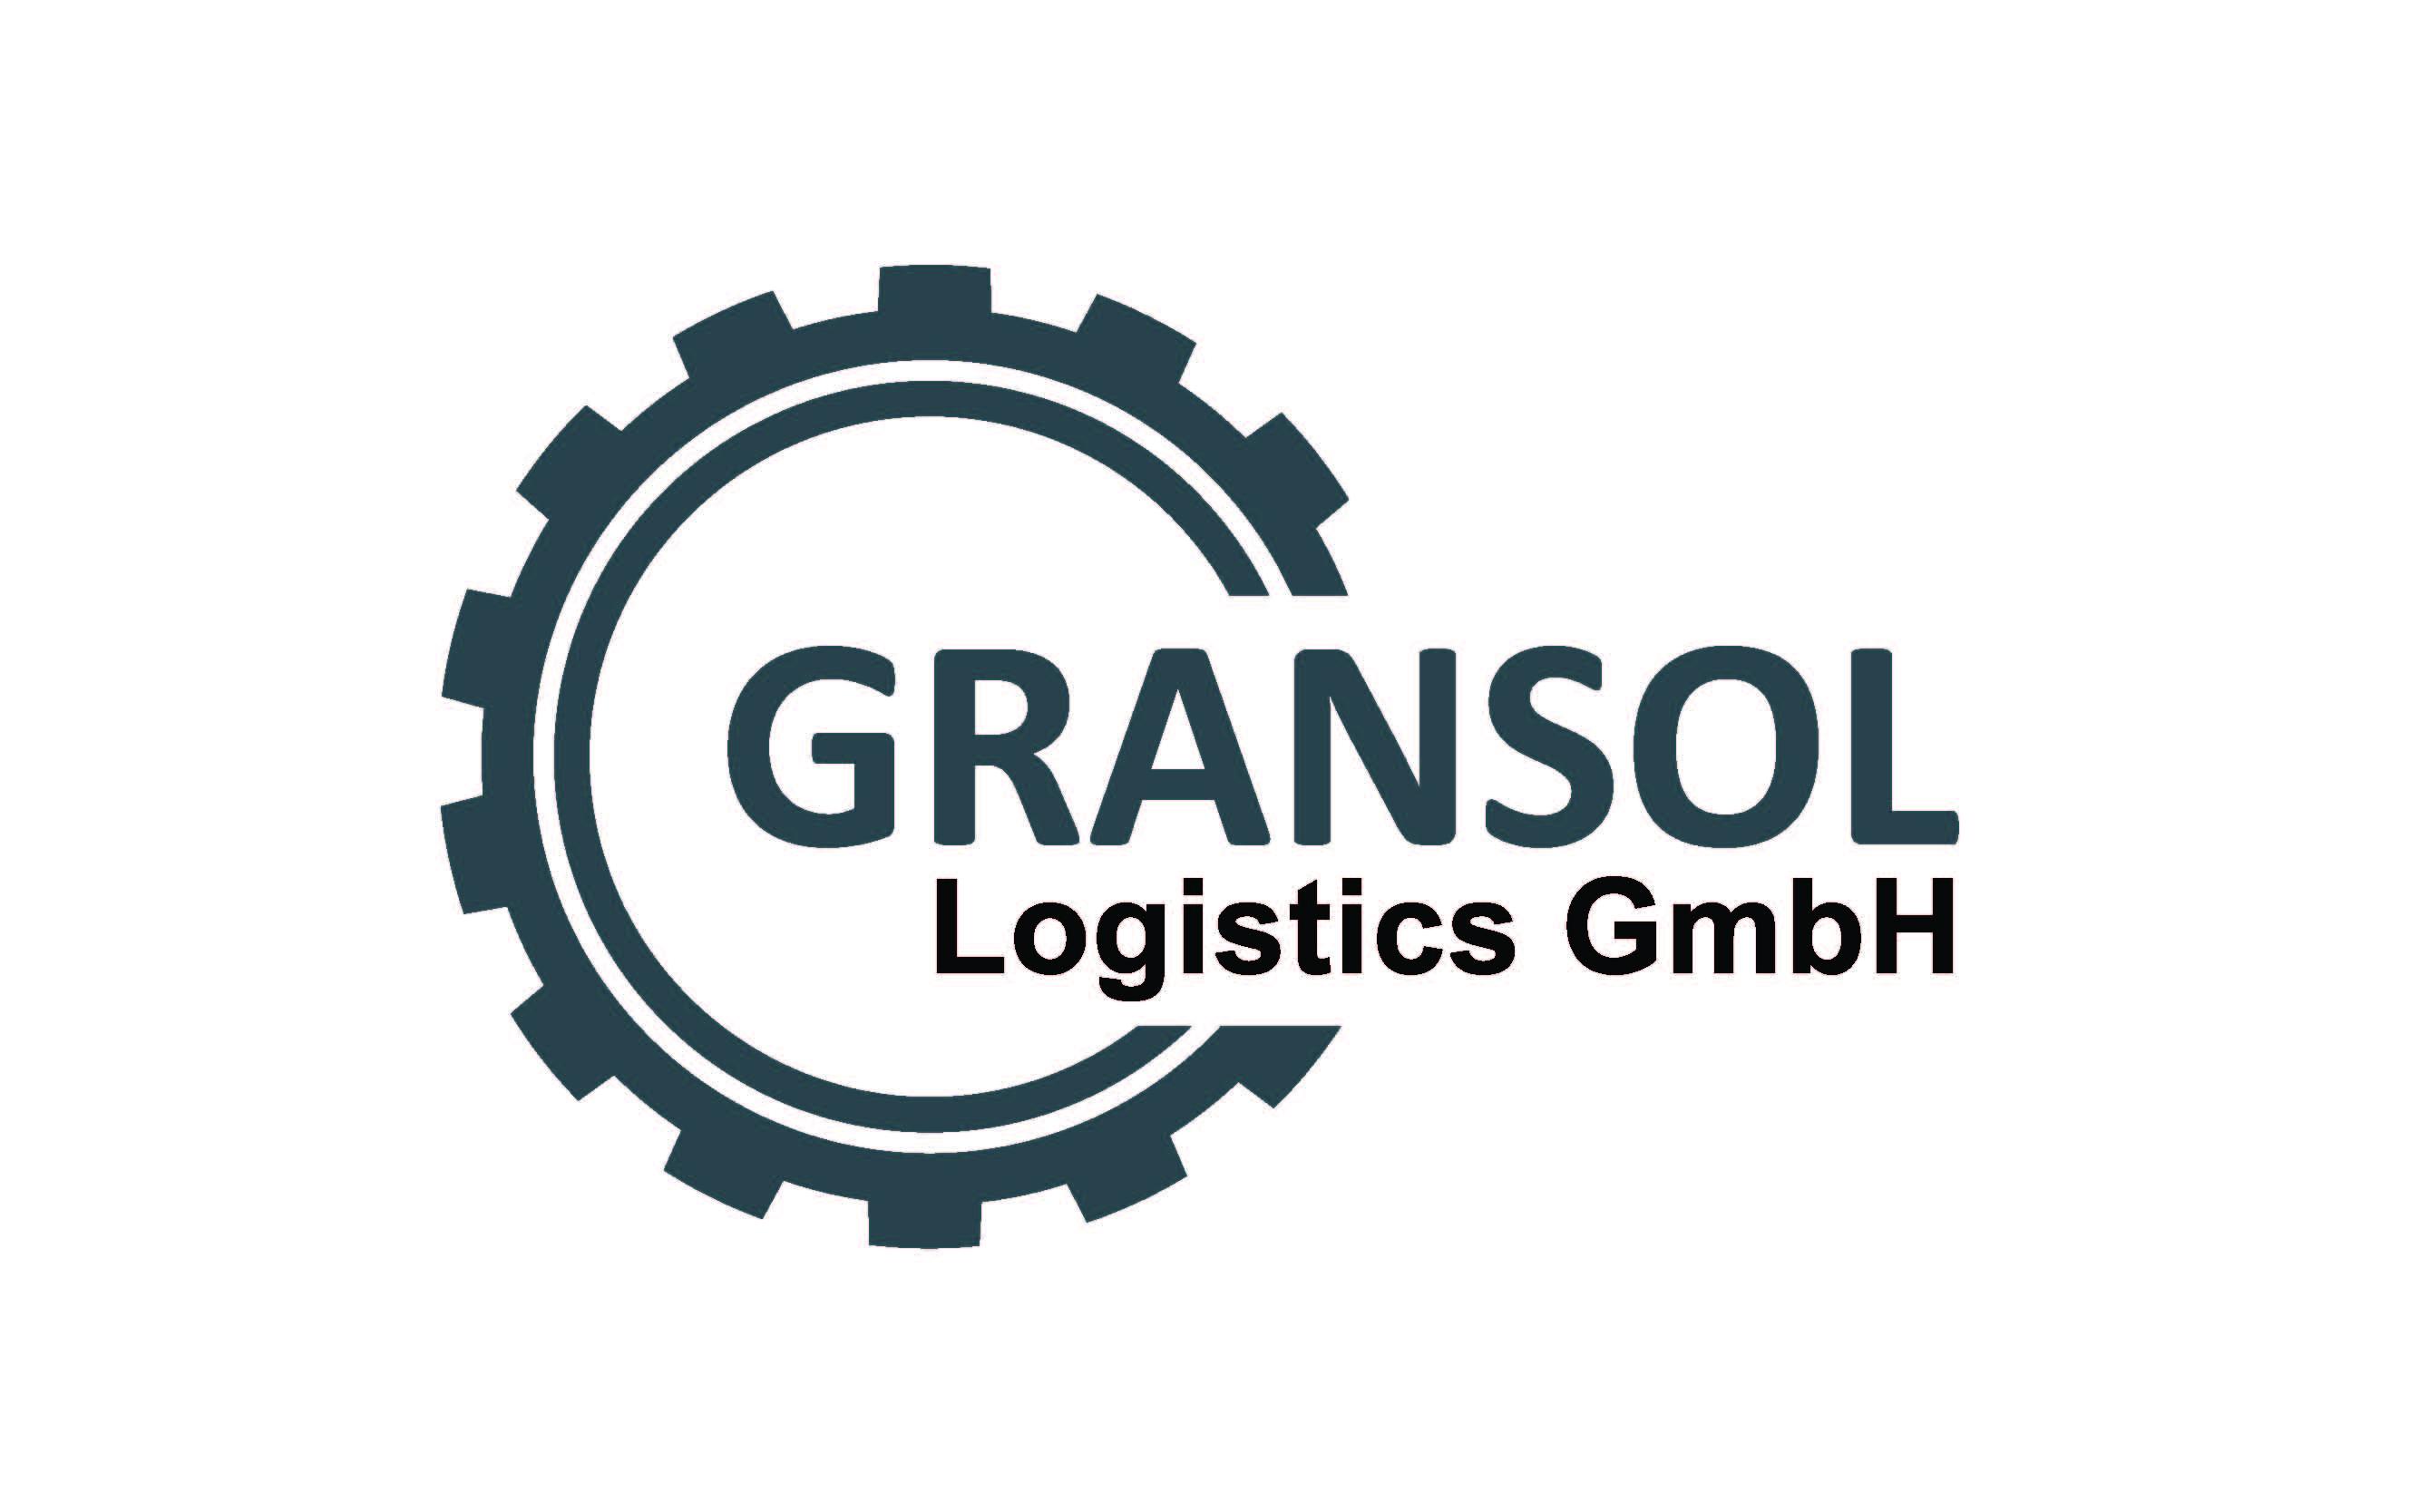 gransol_gmbh_logo